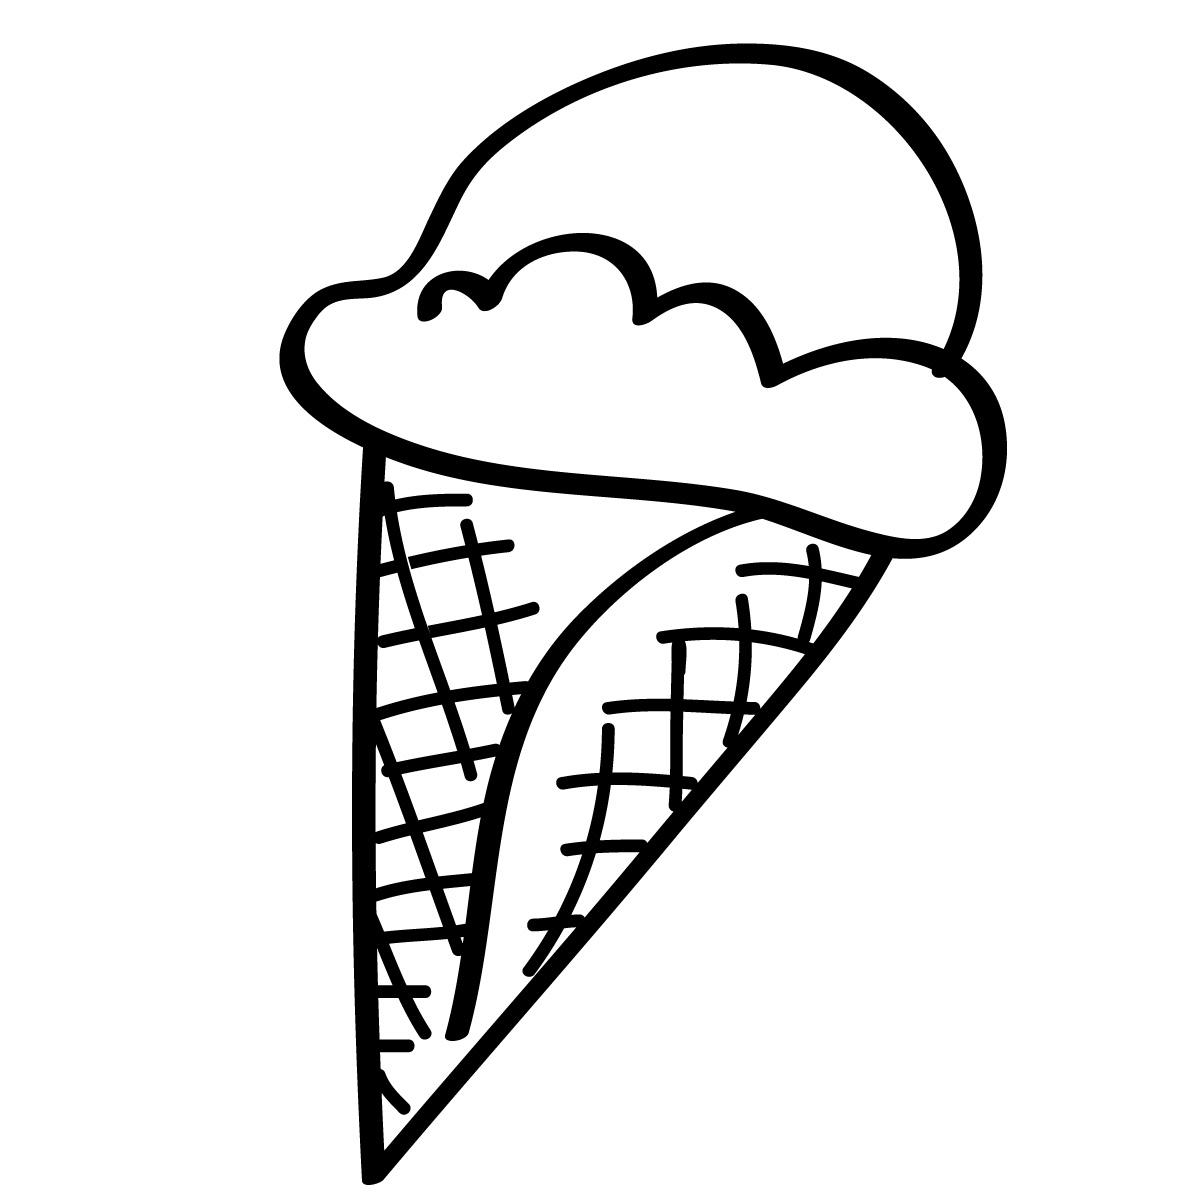 1200x1200 Ice Cream Cone Ice Creamne Clip Art Summer Clipart Ice Image 3 5